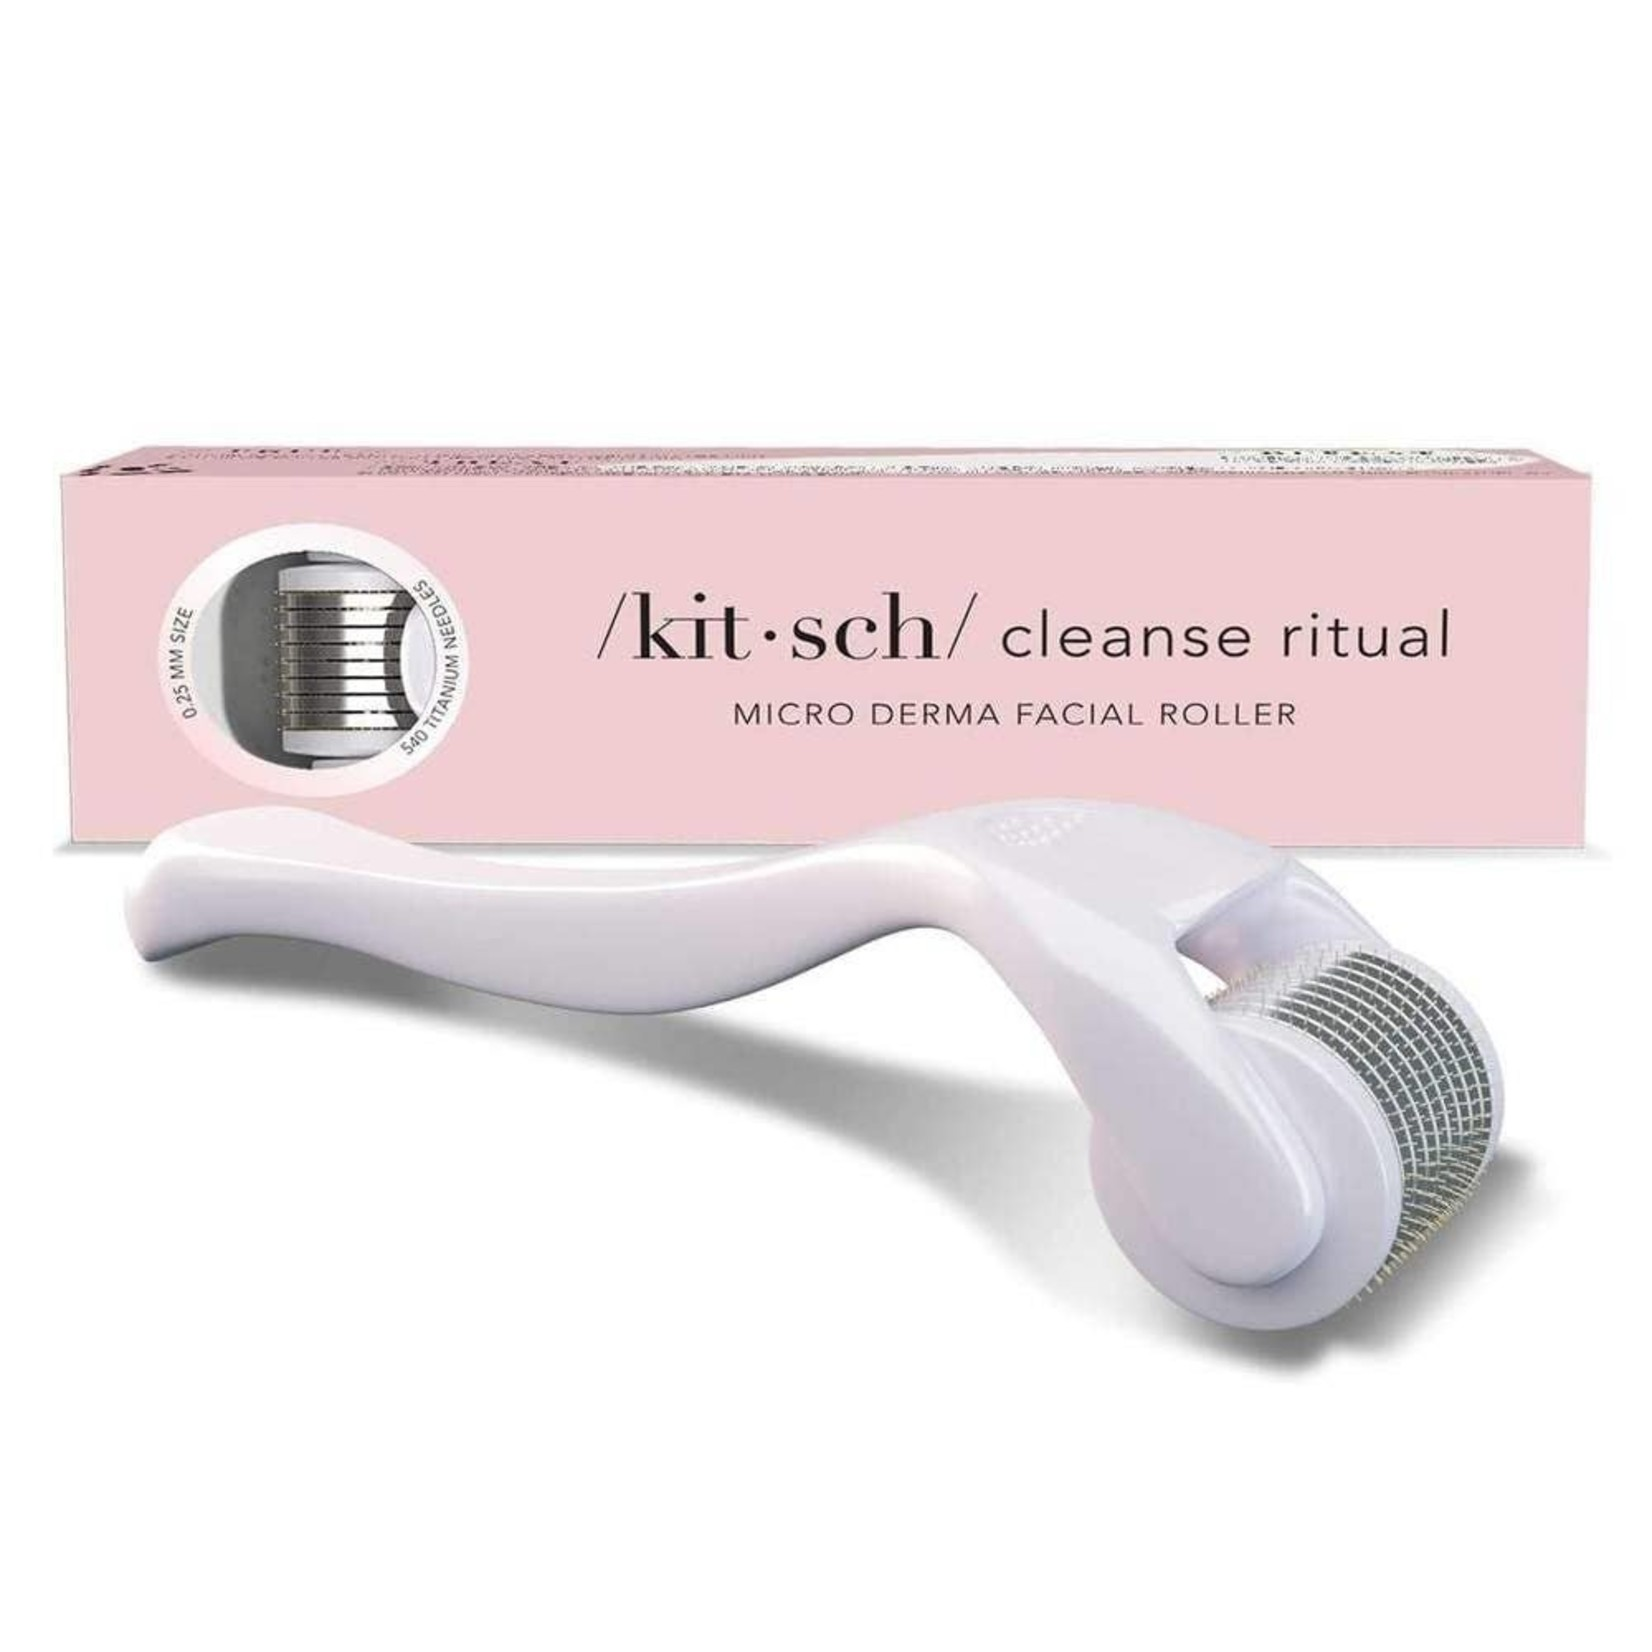 Kitsch Micro Derma Facial Roller in White